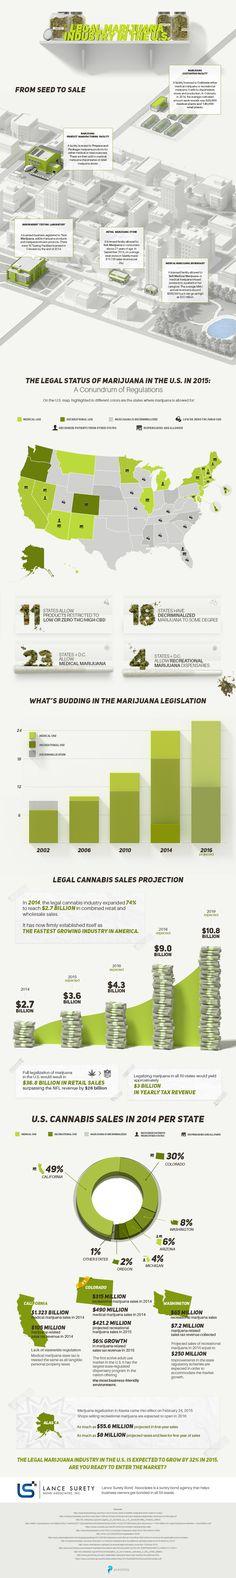 42 Best Weed images in 2018 | Hemp, Cannabis, Garden